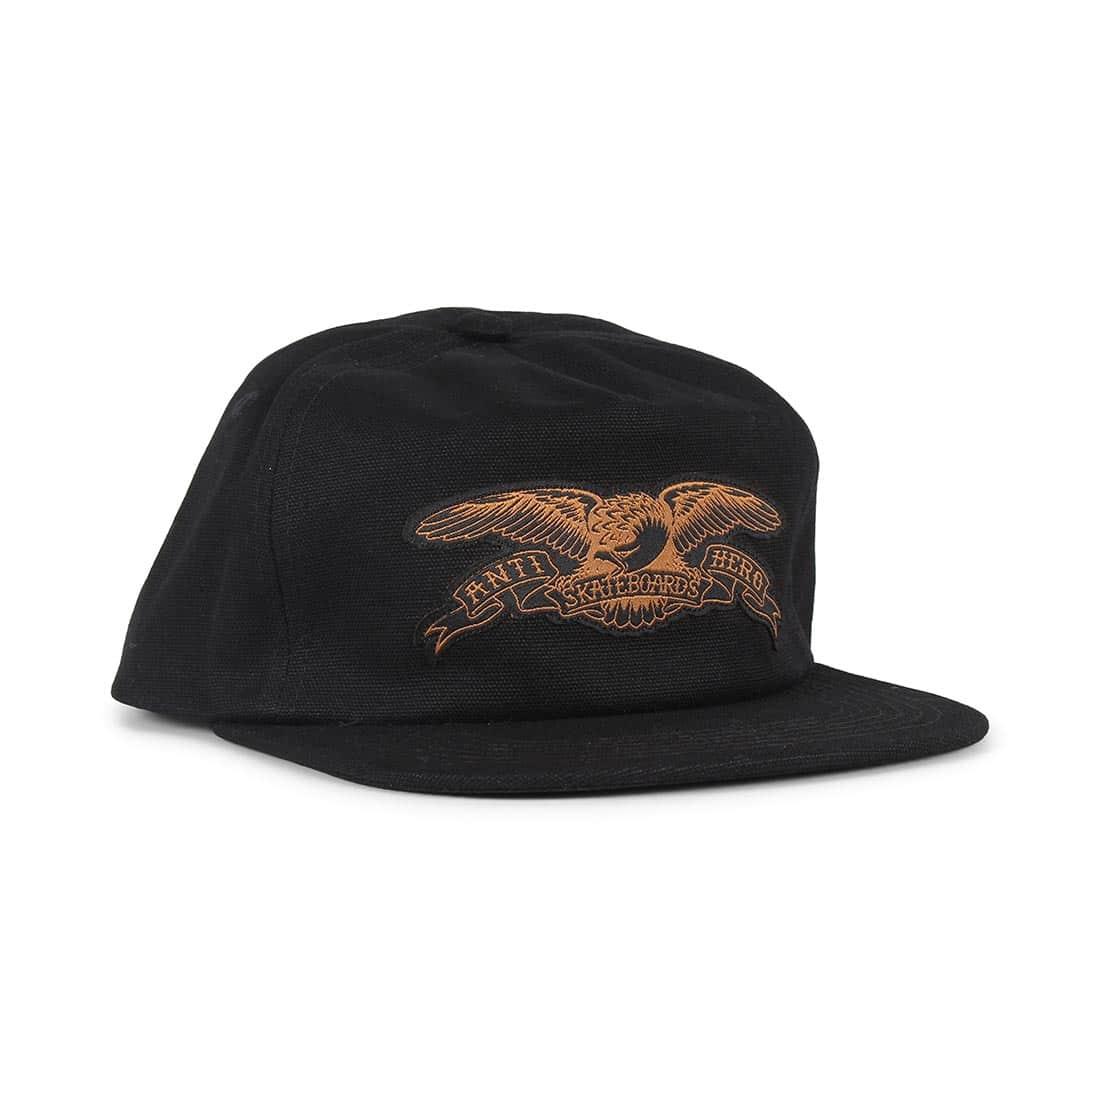 Anti Hero Basic Eagle Patch Snapback Cap - Black / Brown